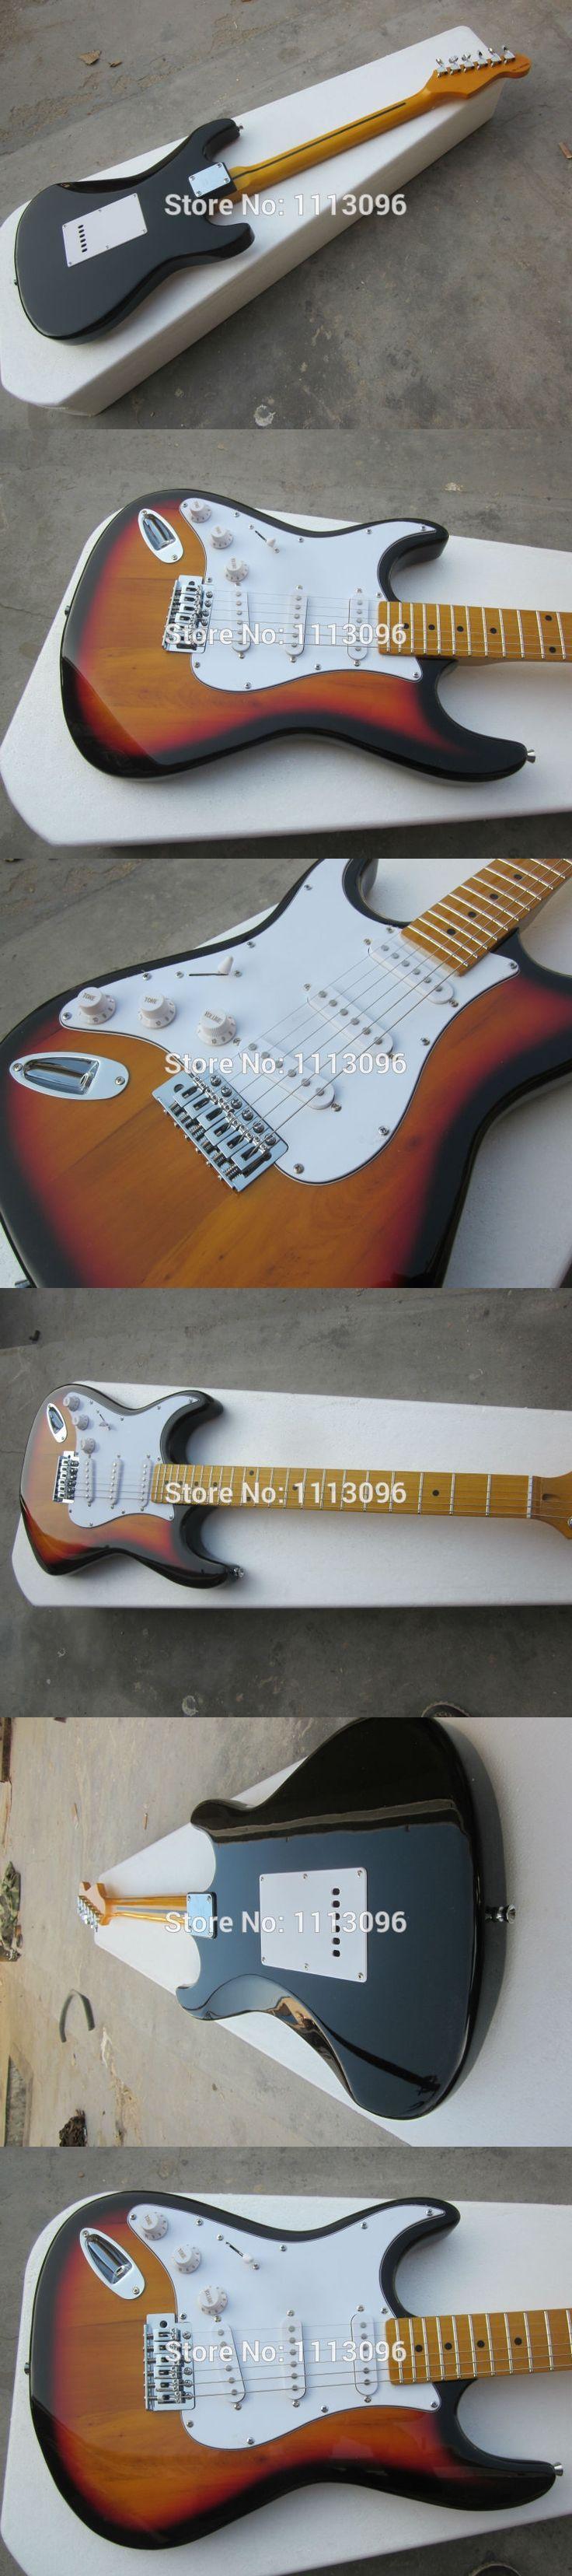 Free shipping wholsale NEW guitarra st guitarra sunburse color maple neck left hand electric